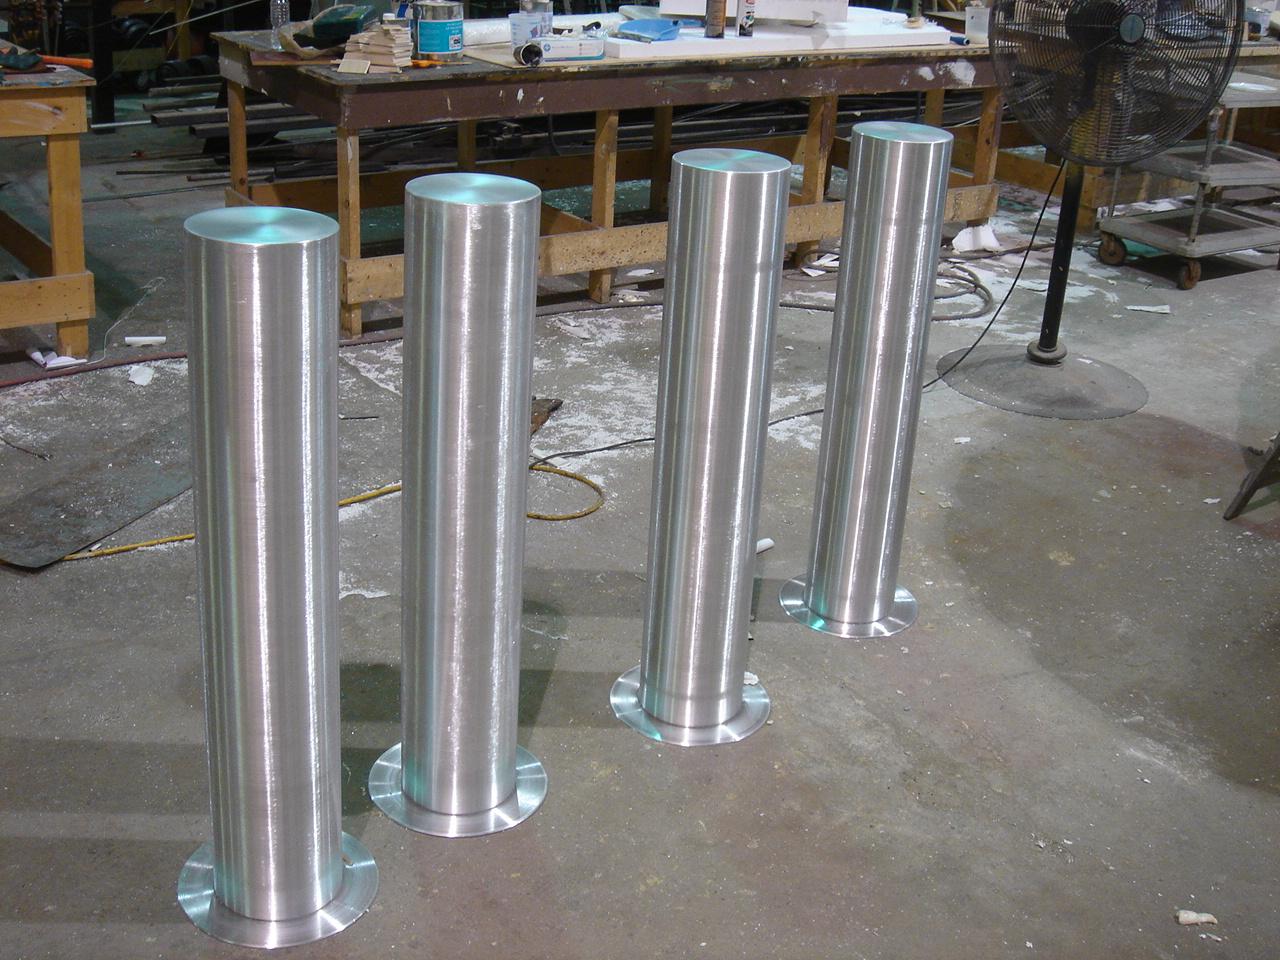 aluminum kitchen chairs games parking bollards — miami prop rental